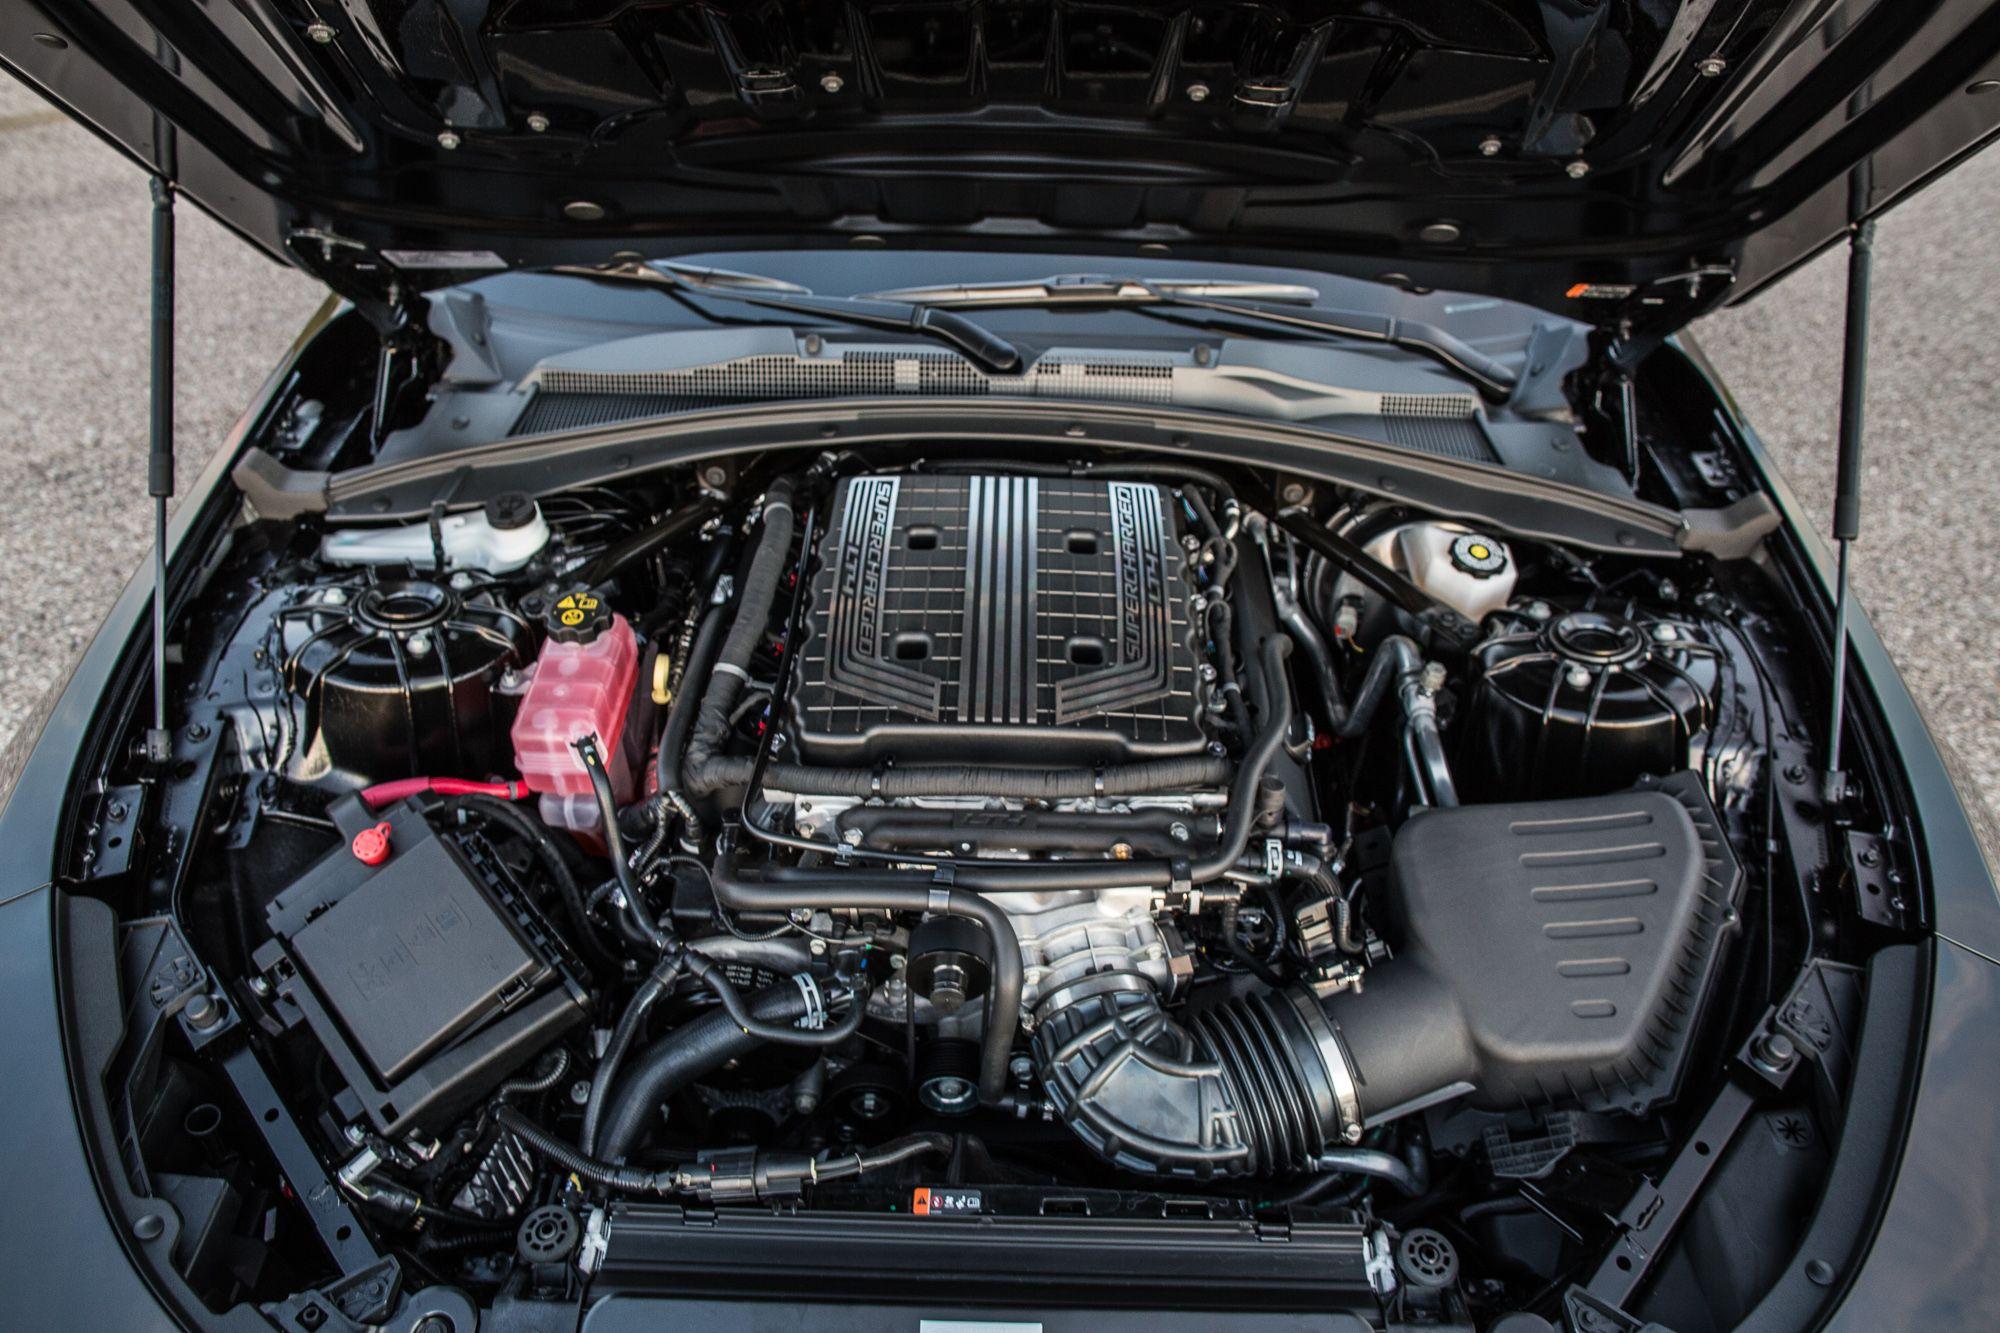 2014 zl1 camaro recaro seats html 2017 2018 cars reviews - Zl1 Camaro Hennessey 2017